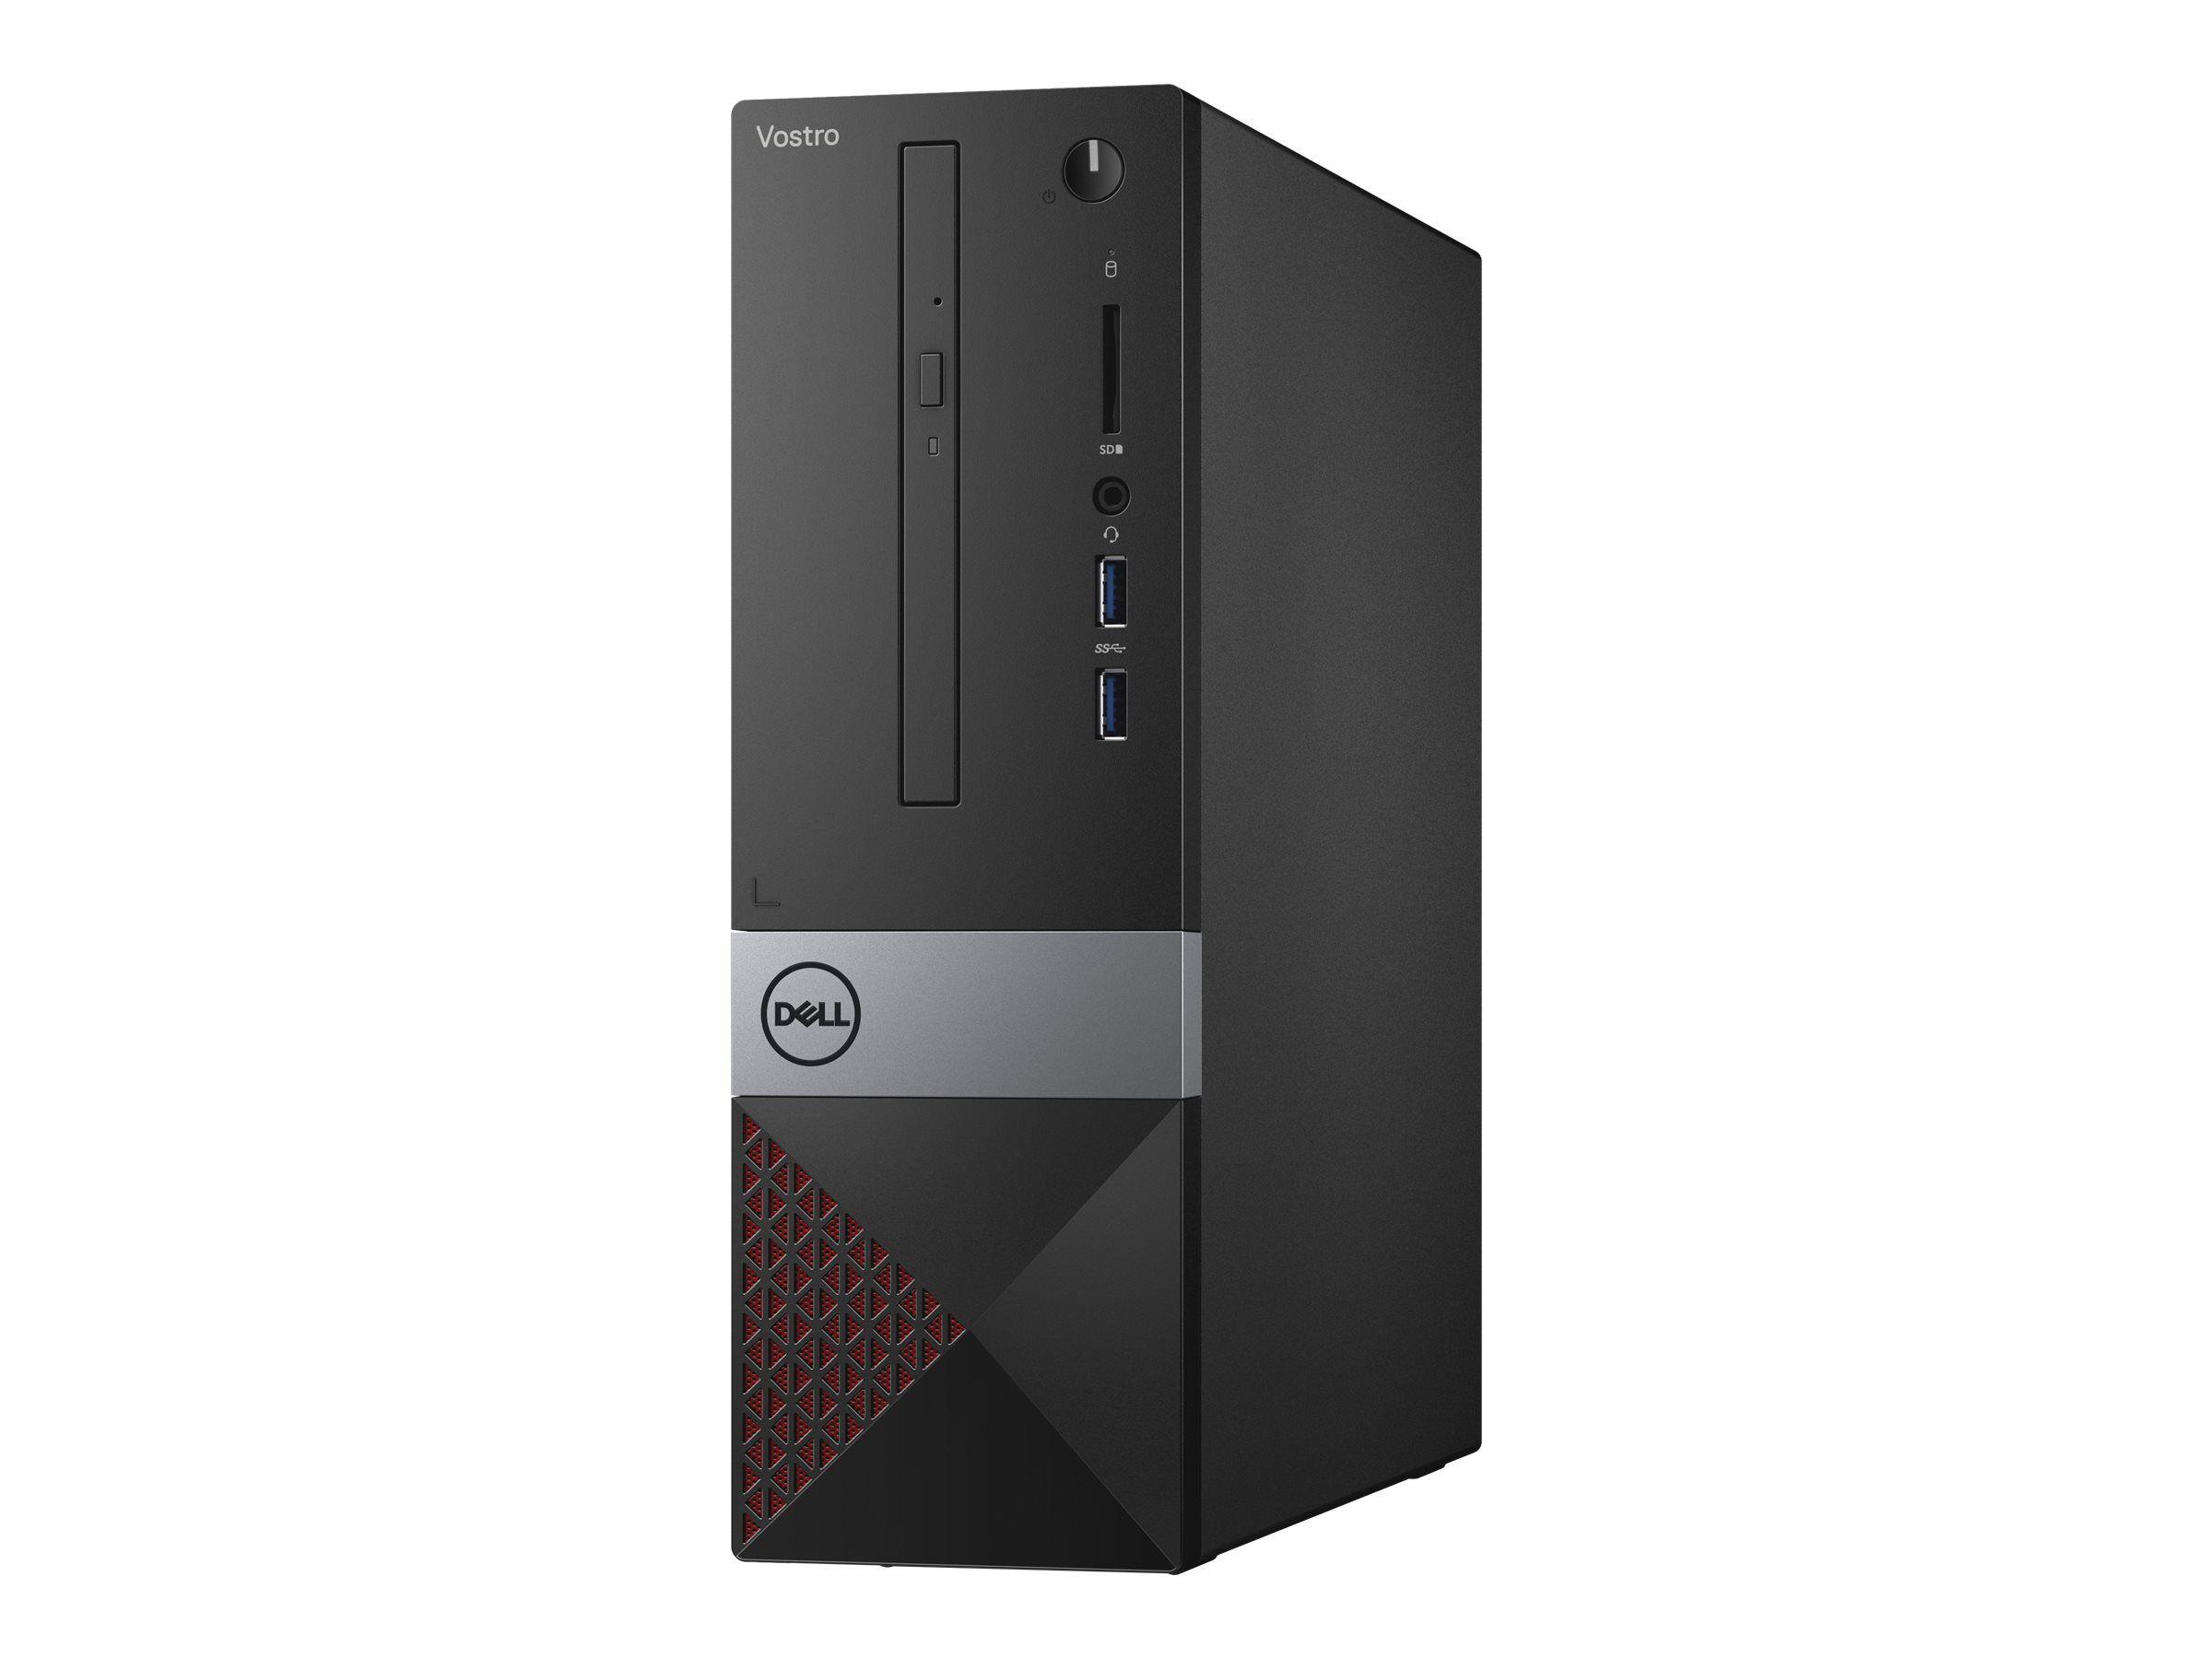 Dell Vostro 3471 - SFF - Core i3 9100 / 3.6 GHz - RAM 4 Go - HDD 1 To - graveur de DVD - UHD Graphics 630 - GigE - LAN sans fil: 802.11b/g/n, Bluetooth 4.0 - Win 10 Pro 64 bits - moniteur : aucun - avec 1 Year Dell Collect and Return Service